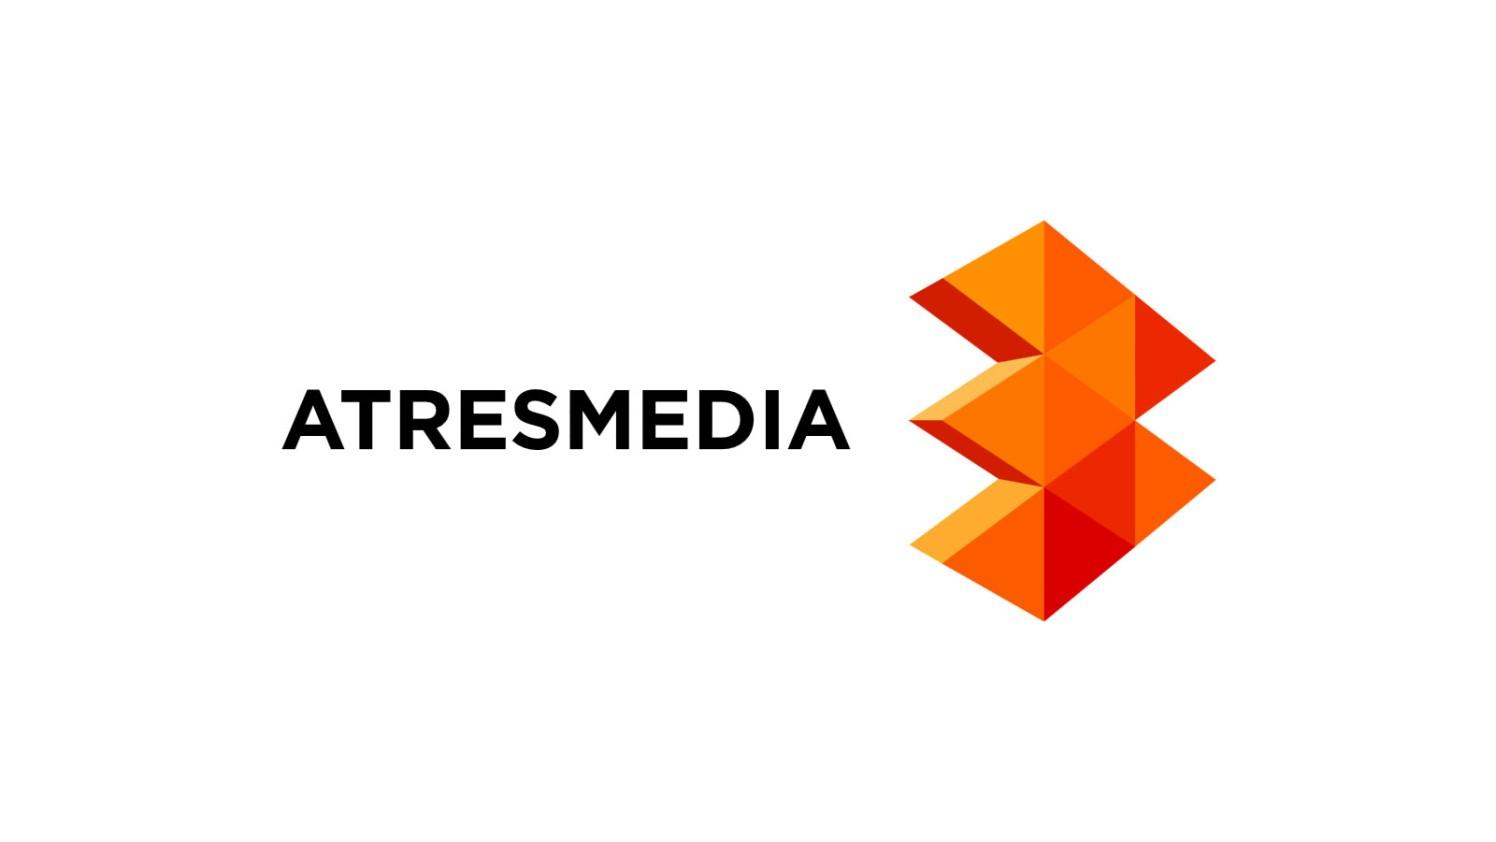 Atresmedia Speaks Of A 'Historical TV Year' 2013 - Bertelsmann SE